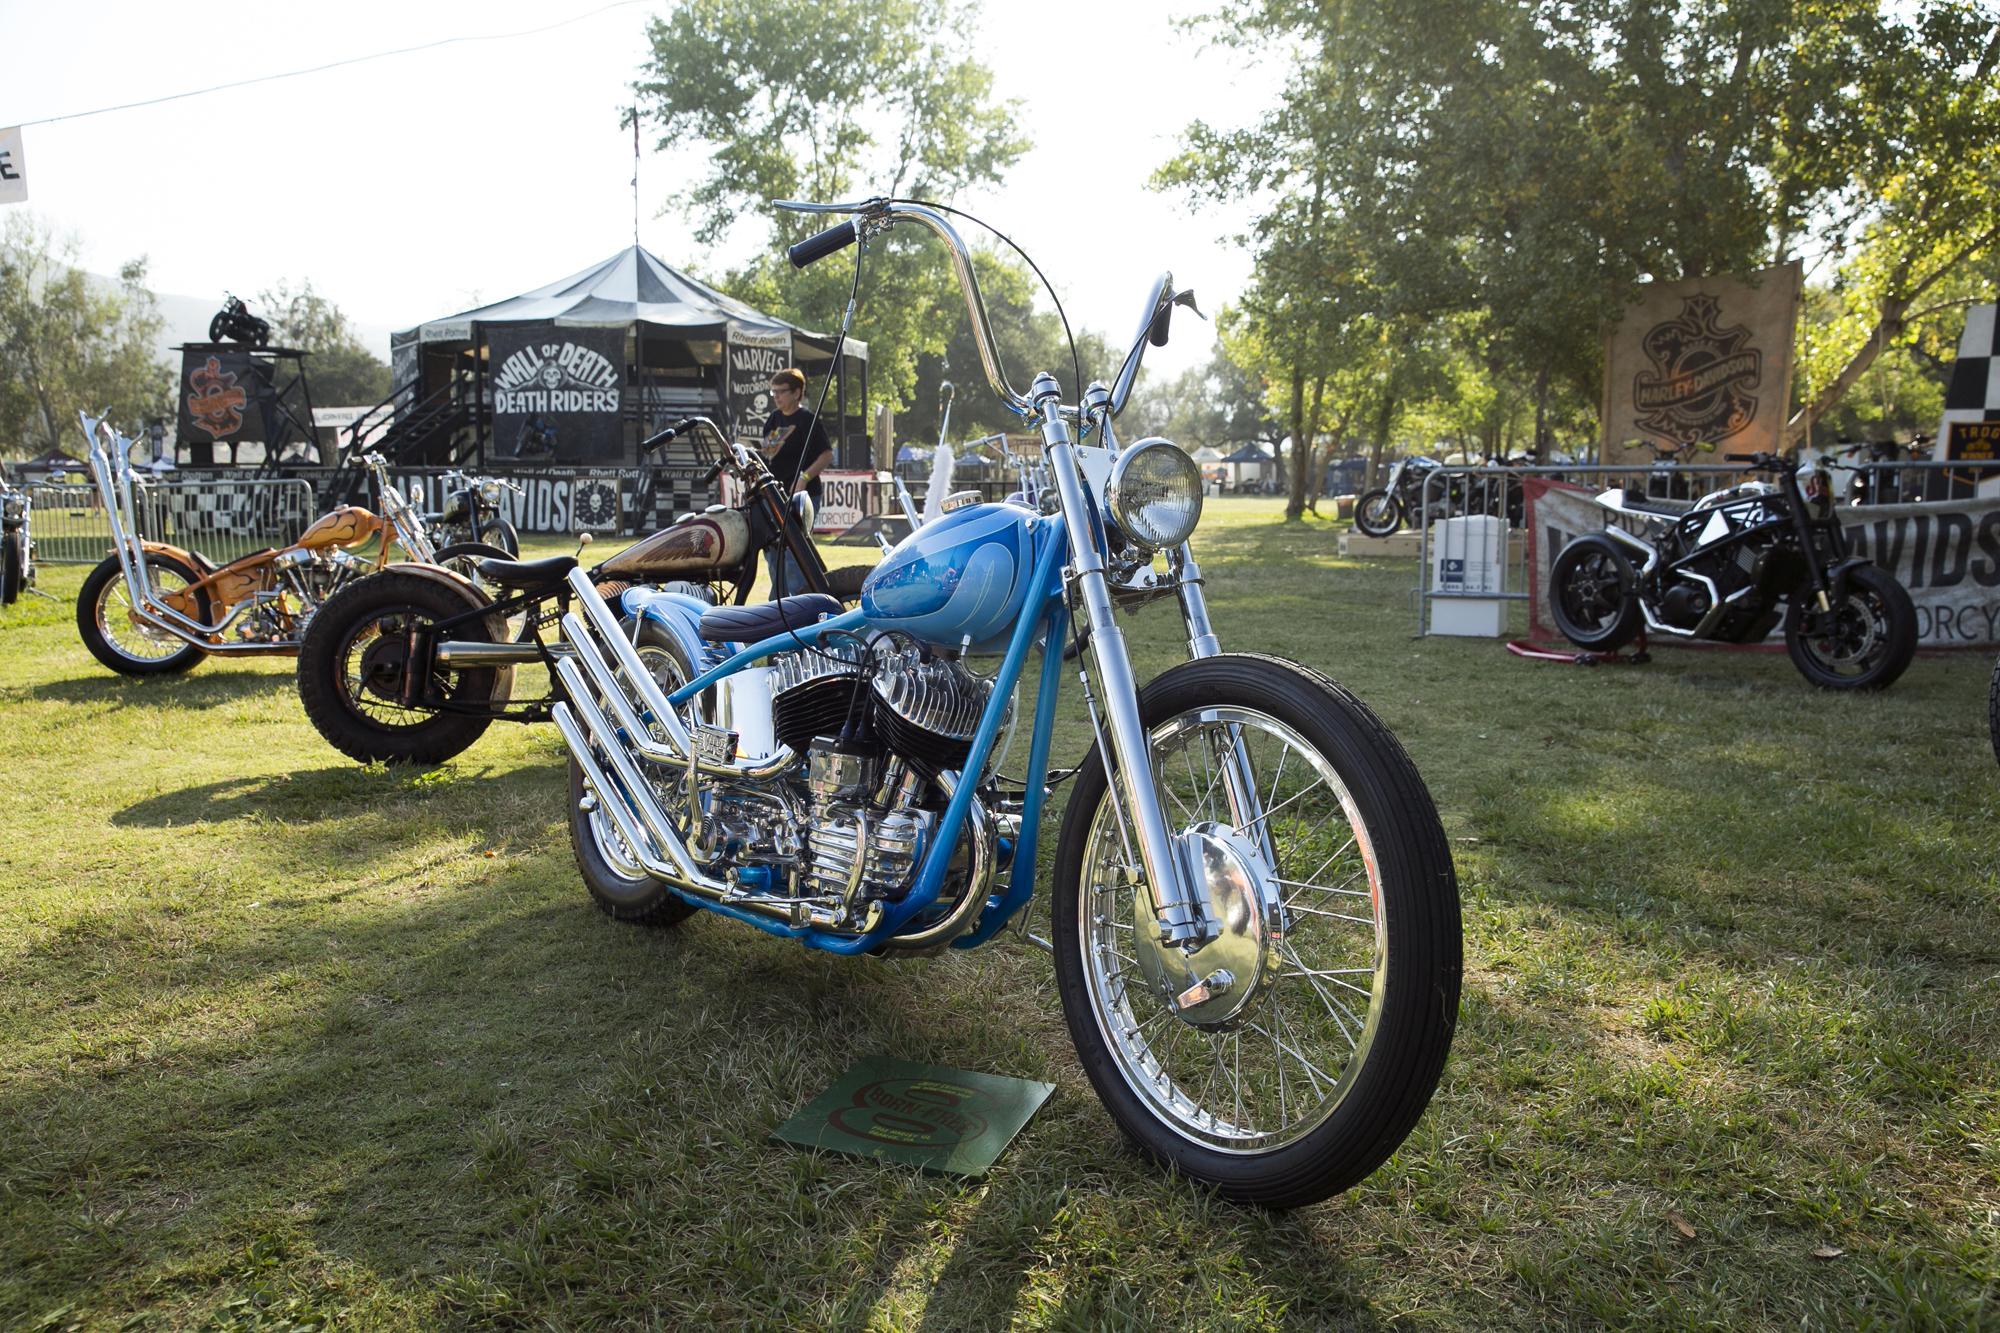 Born Free 8 Motorcycle Show-080.jpg